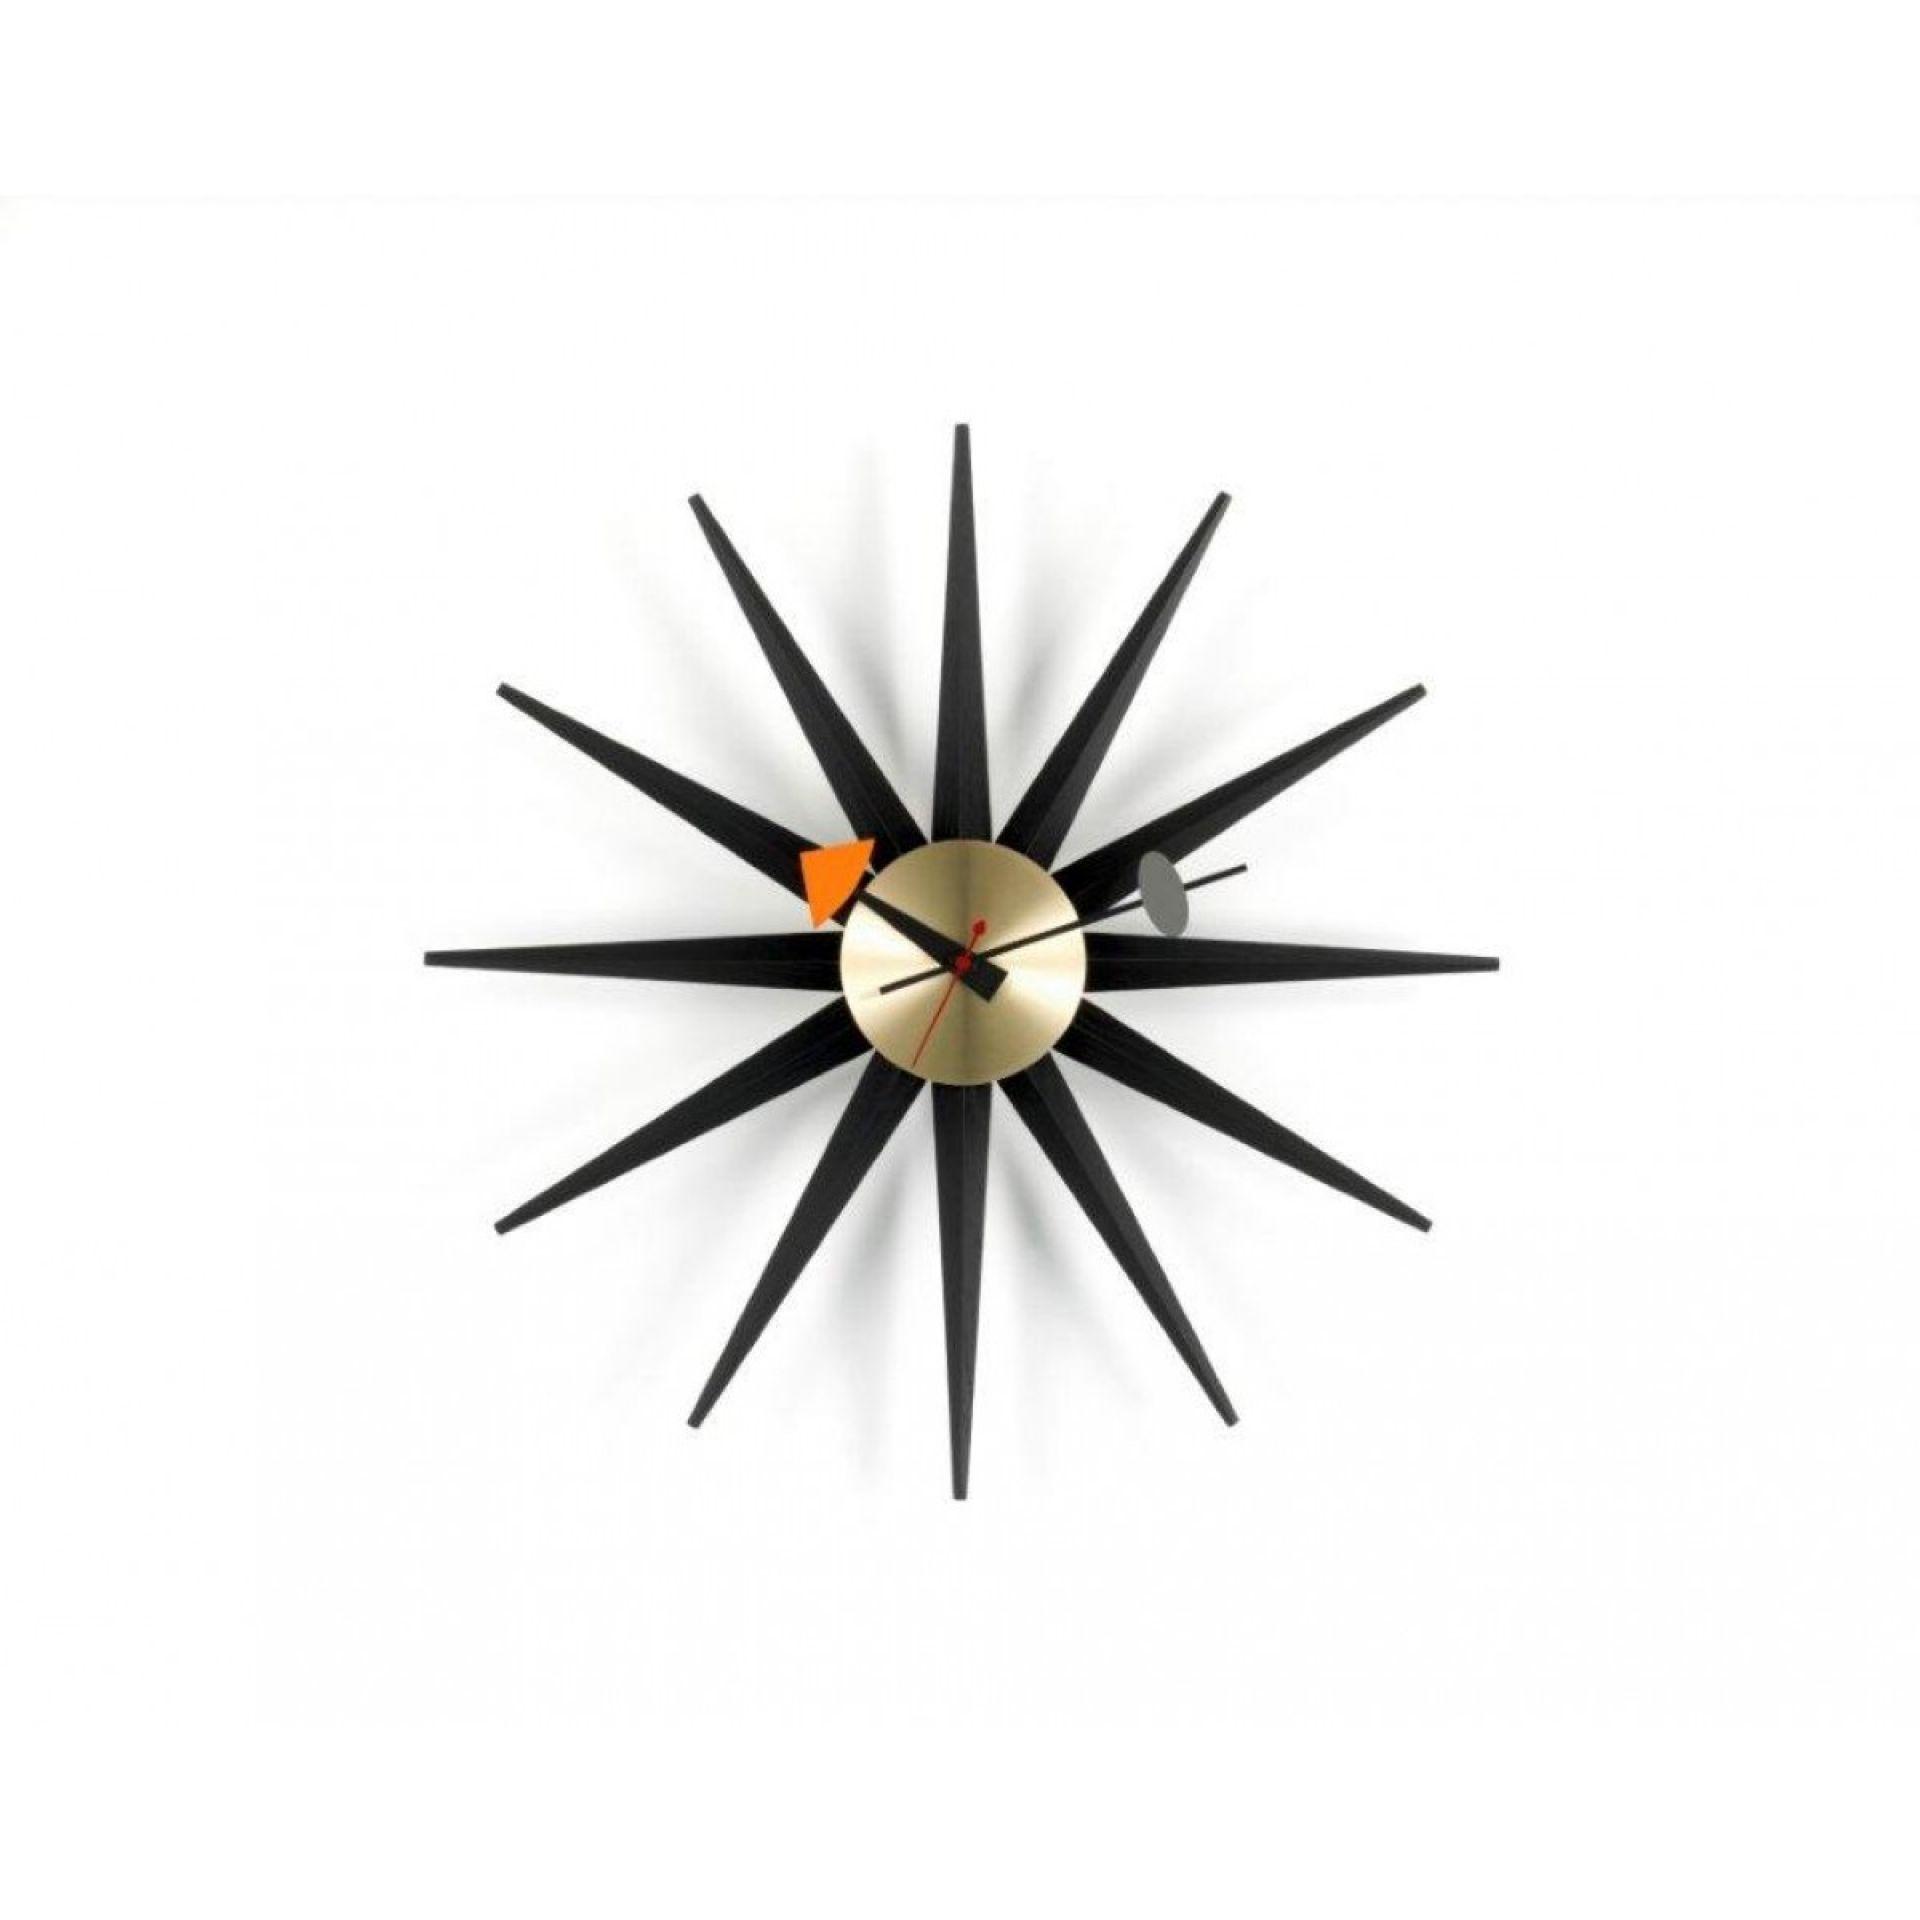 Sunburst Clock Uhr - schwarz / messing Wanduhr Vitra